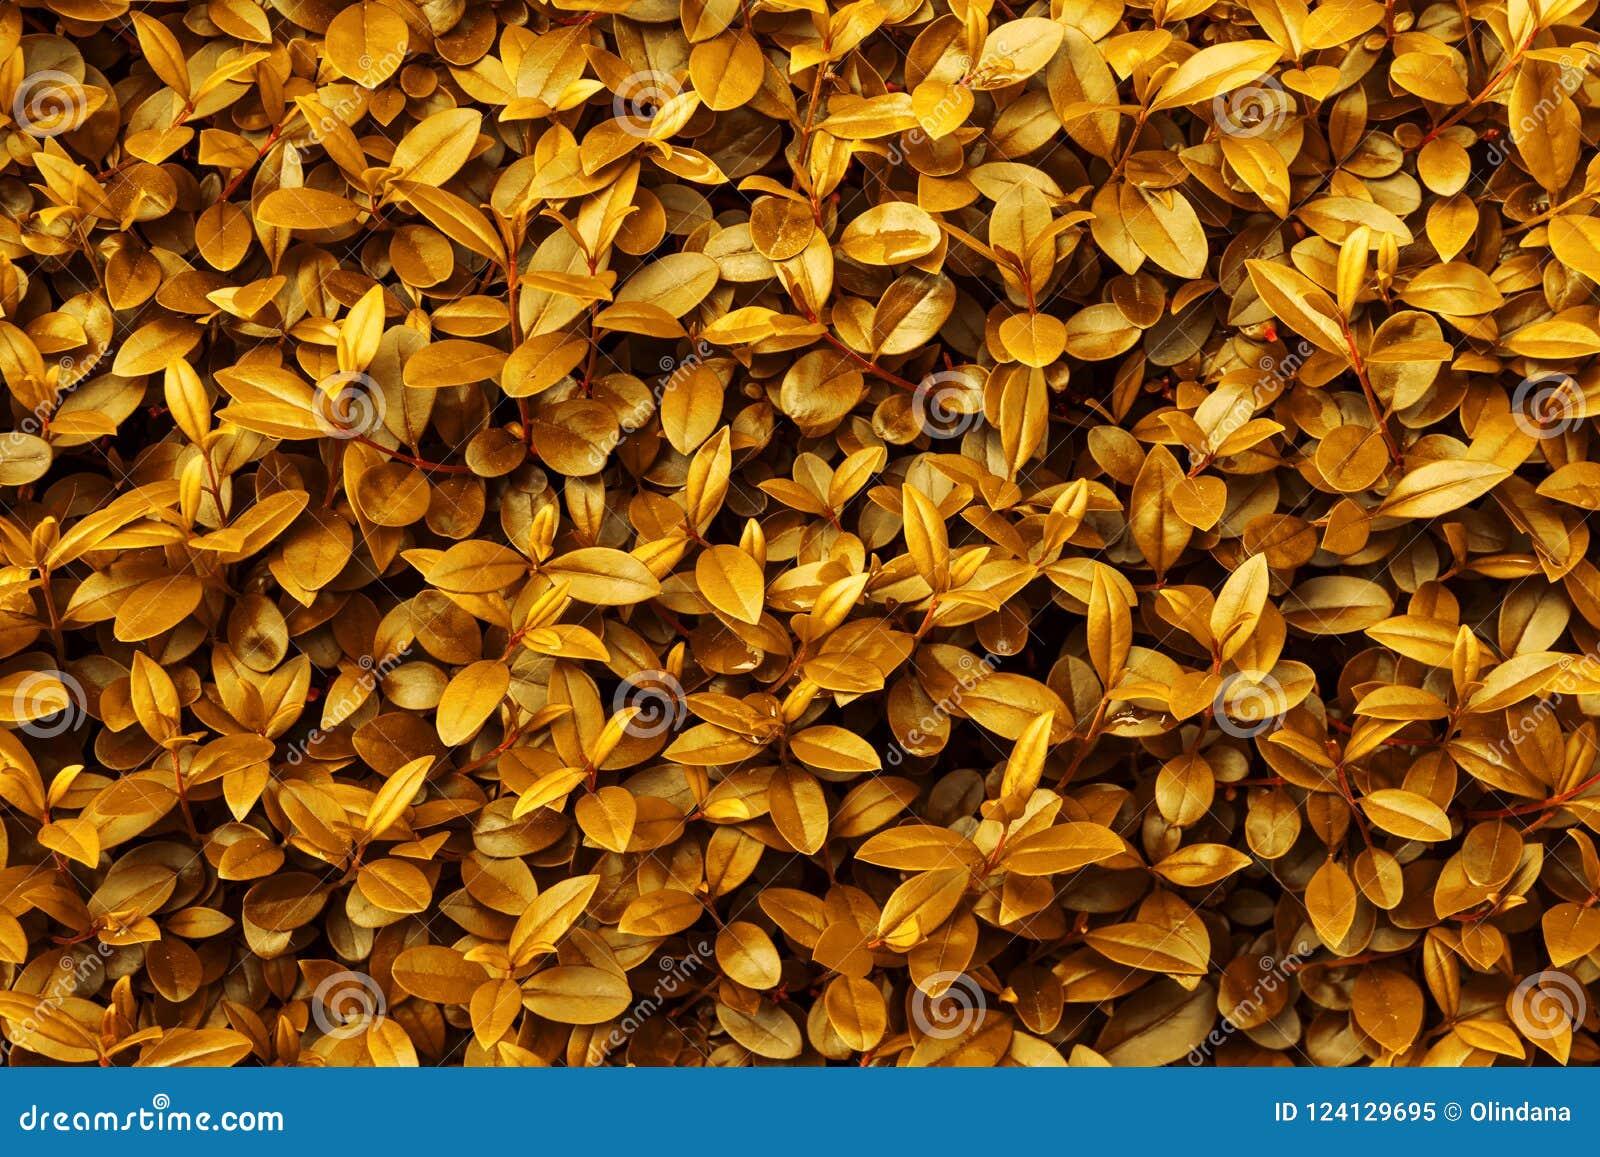 Autumn fall background yellow orange golden foliage pattern. Leaf texture vibrant vivid warm color palette